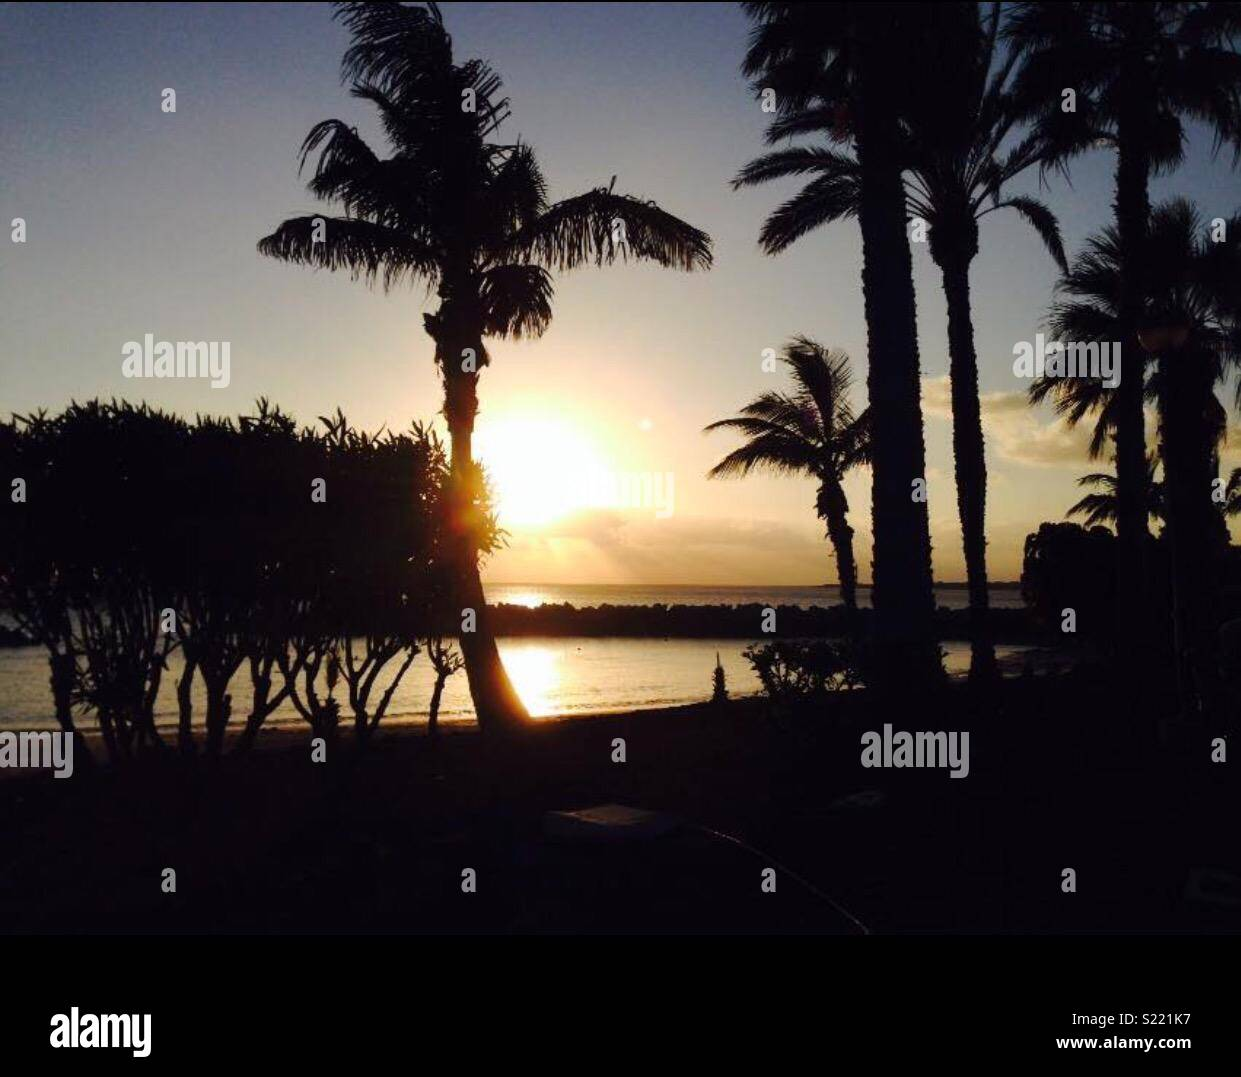 Spanish evening - Stock Image